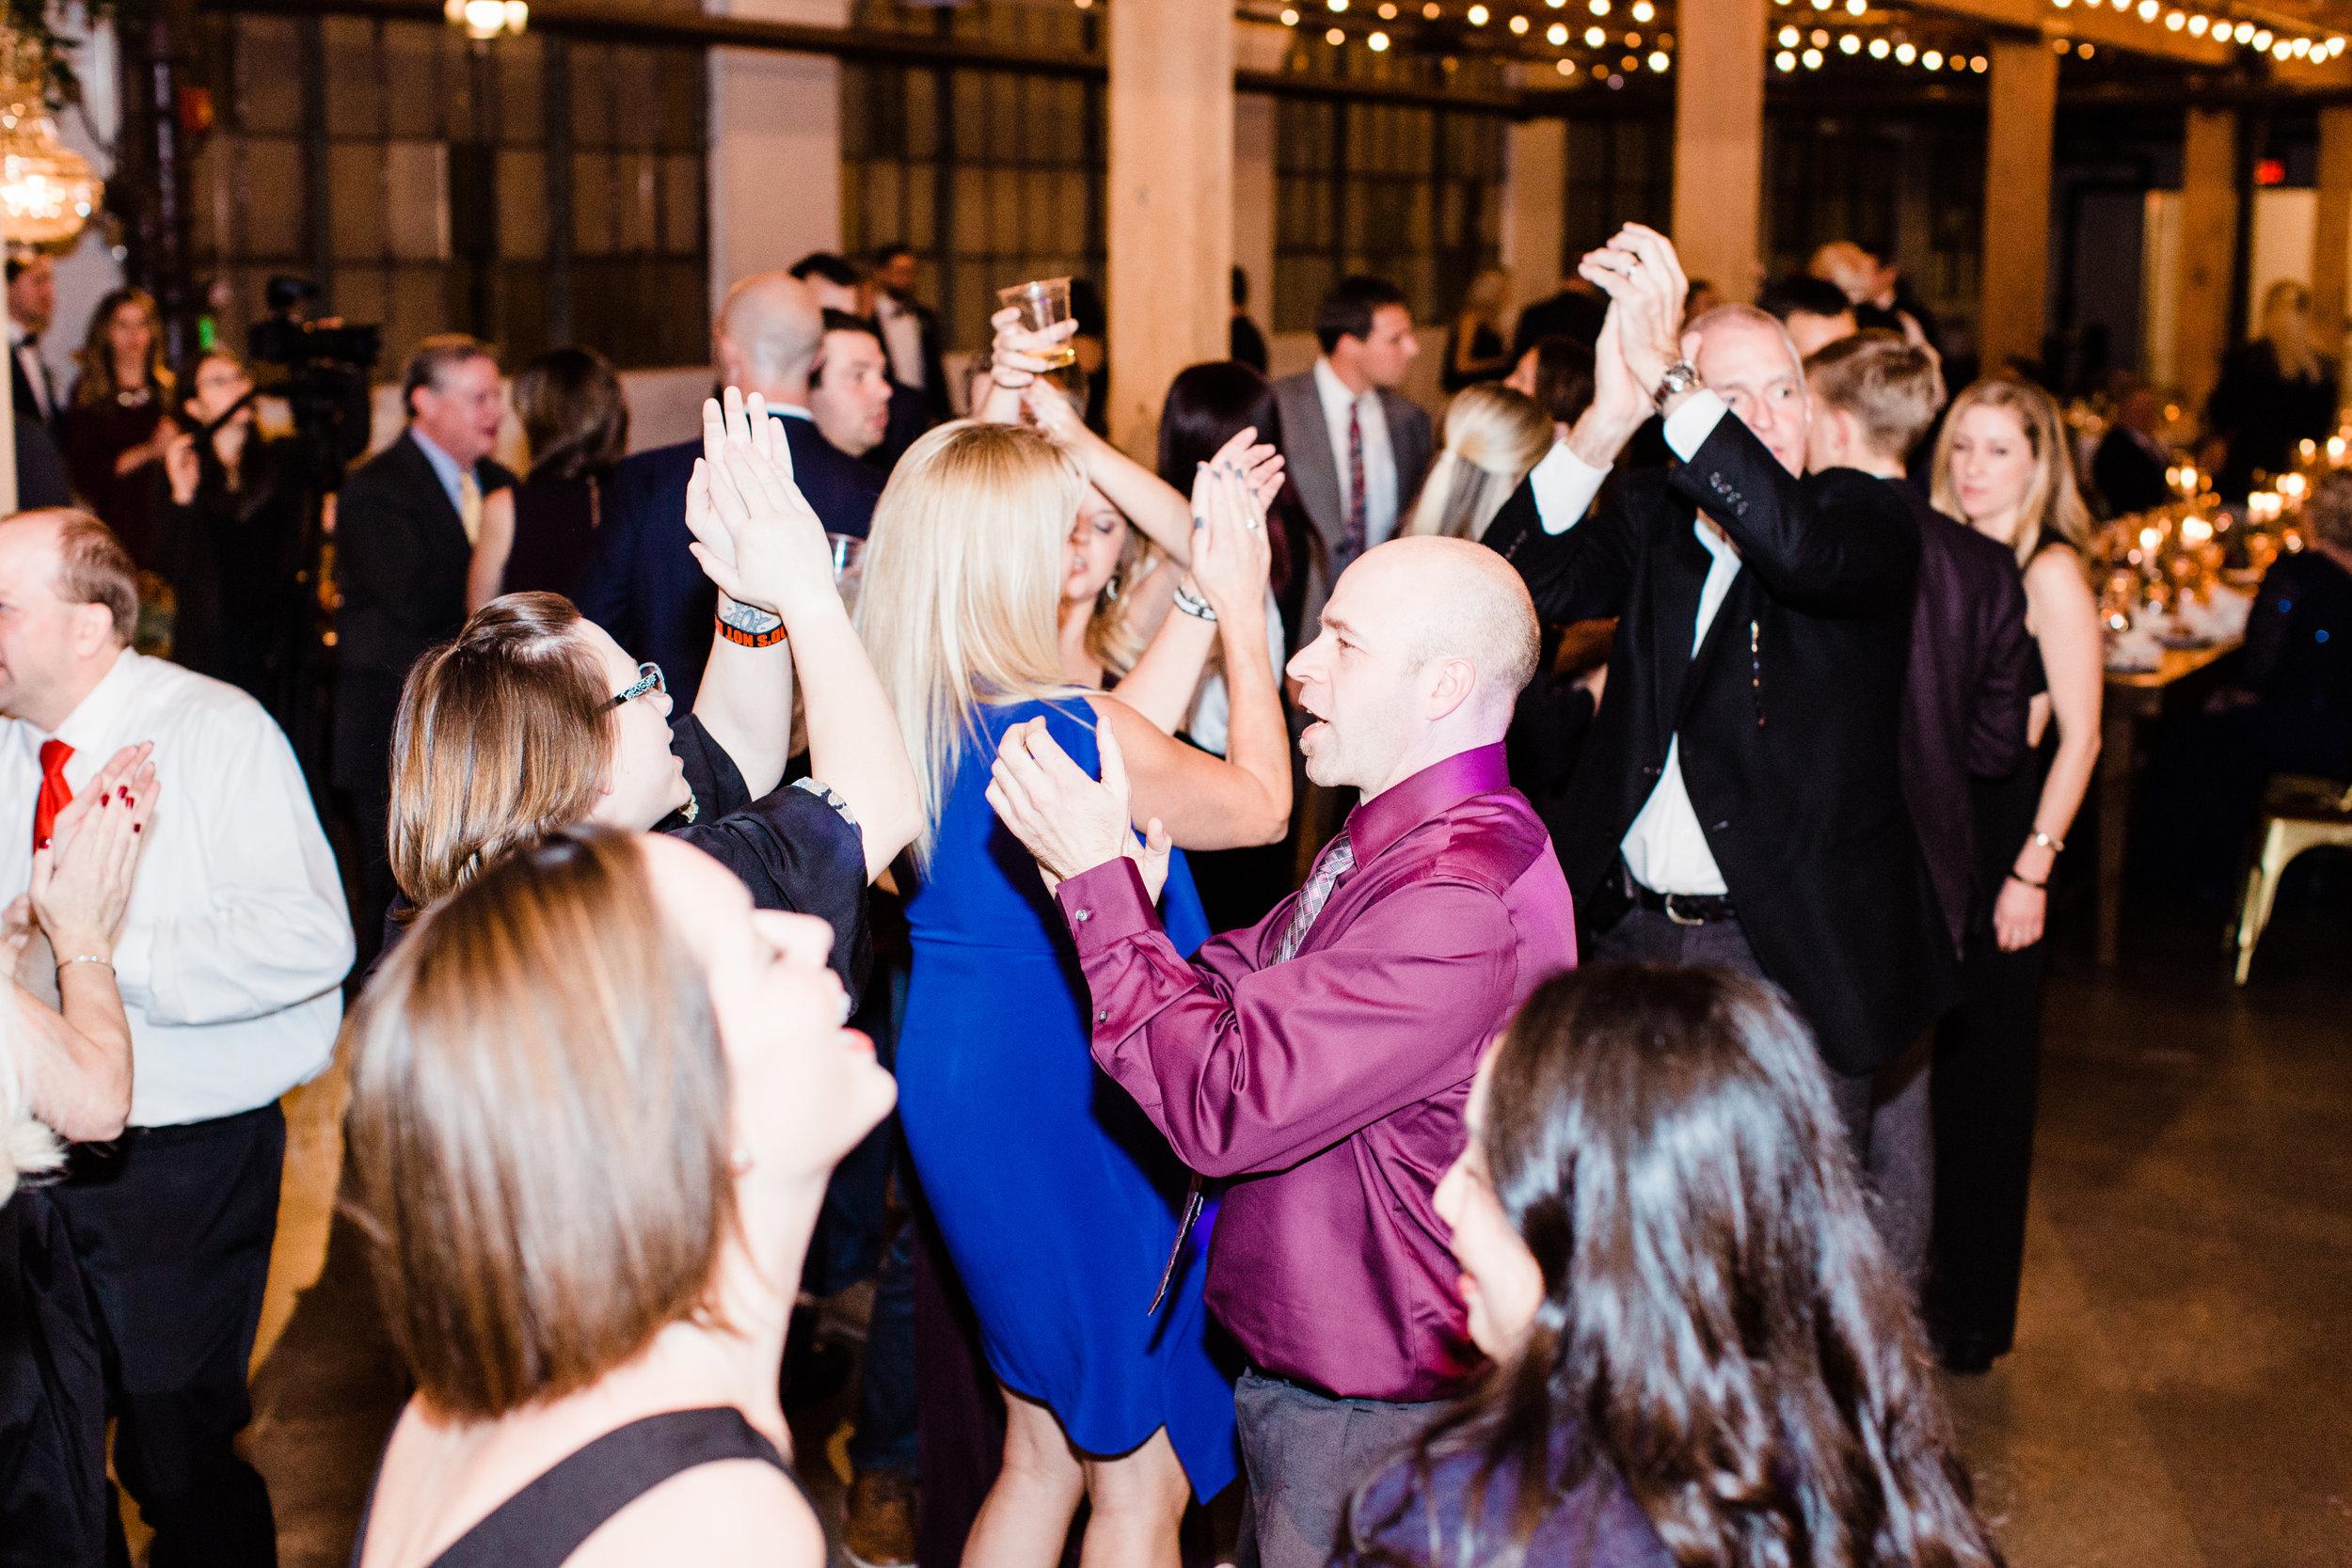 Vogelzang+Wedding+Reception+Dancing2-29.jpg